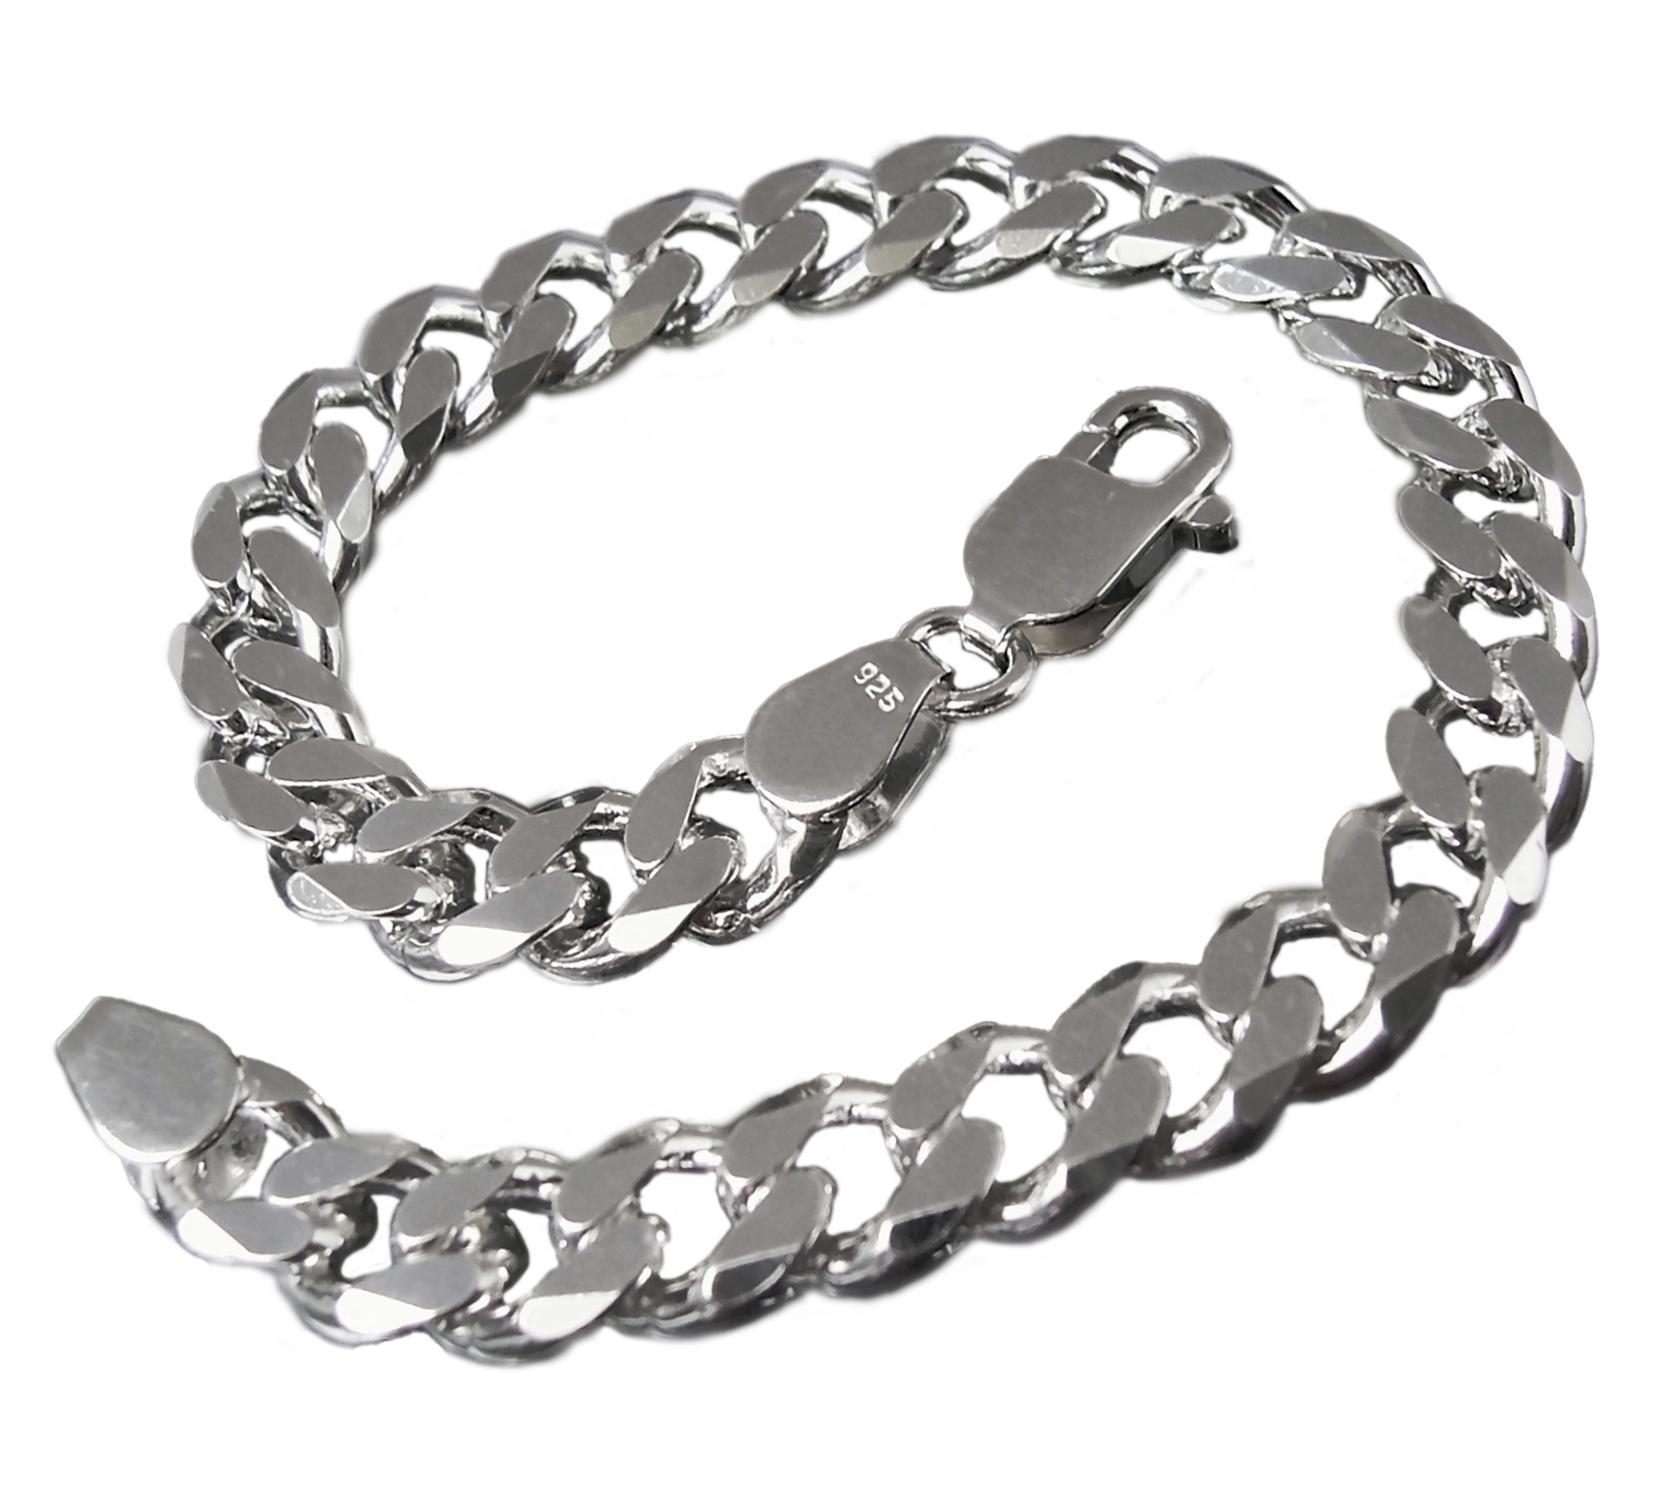 Niklarson Panzerarmband 8,0mmx23cm Sterling Silber 925 Silberarmband 13580-23